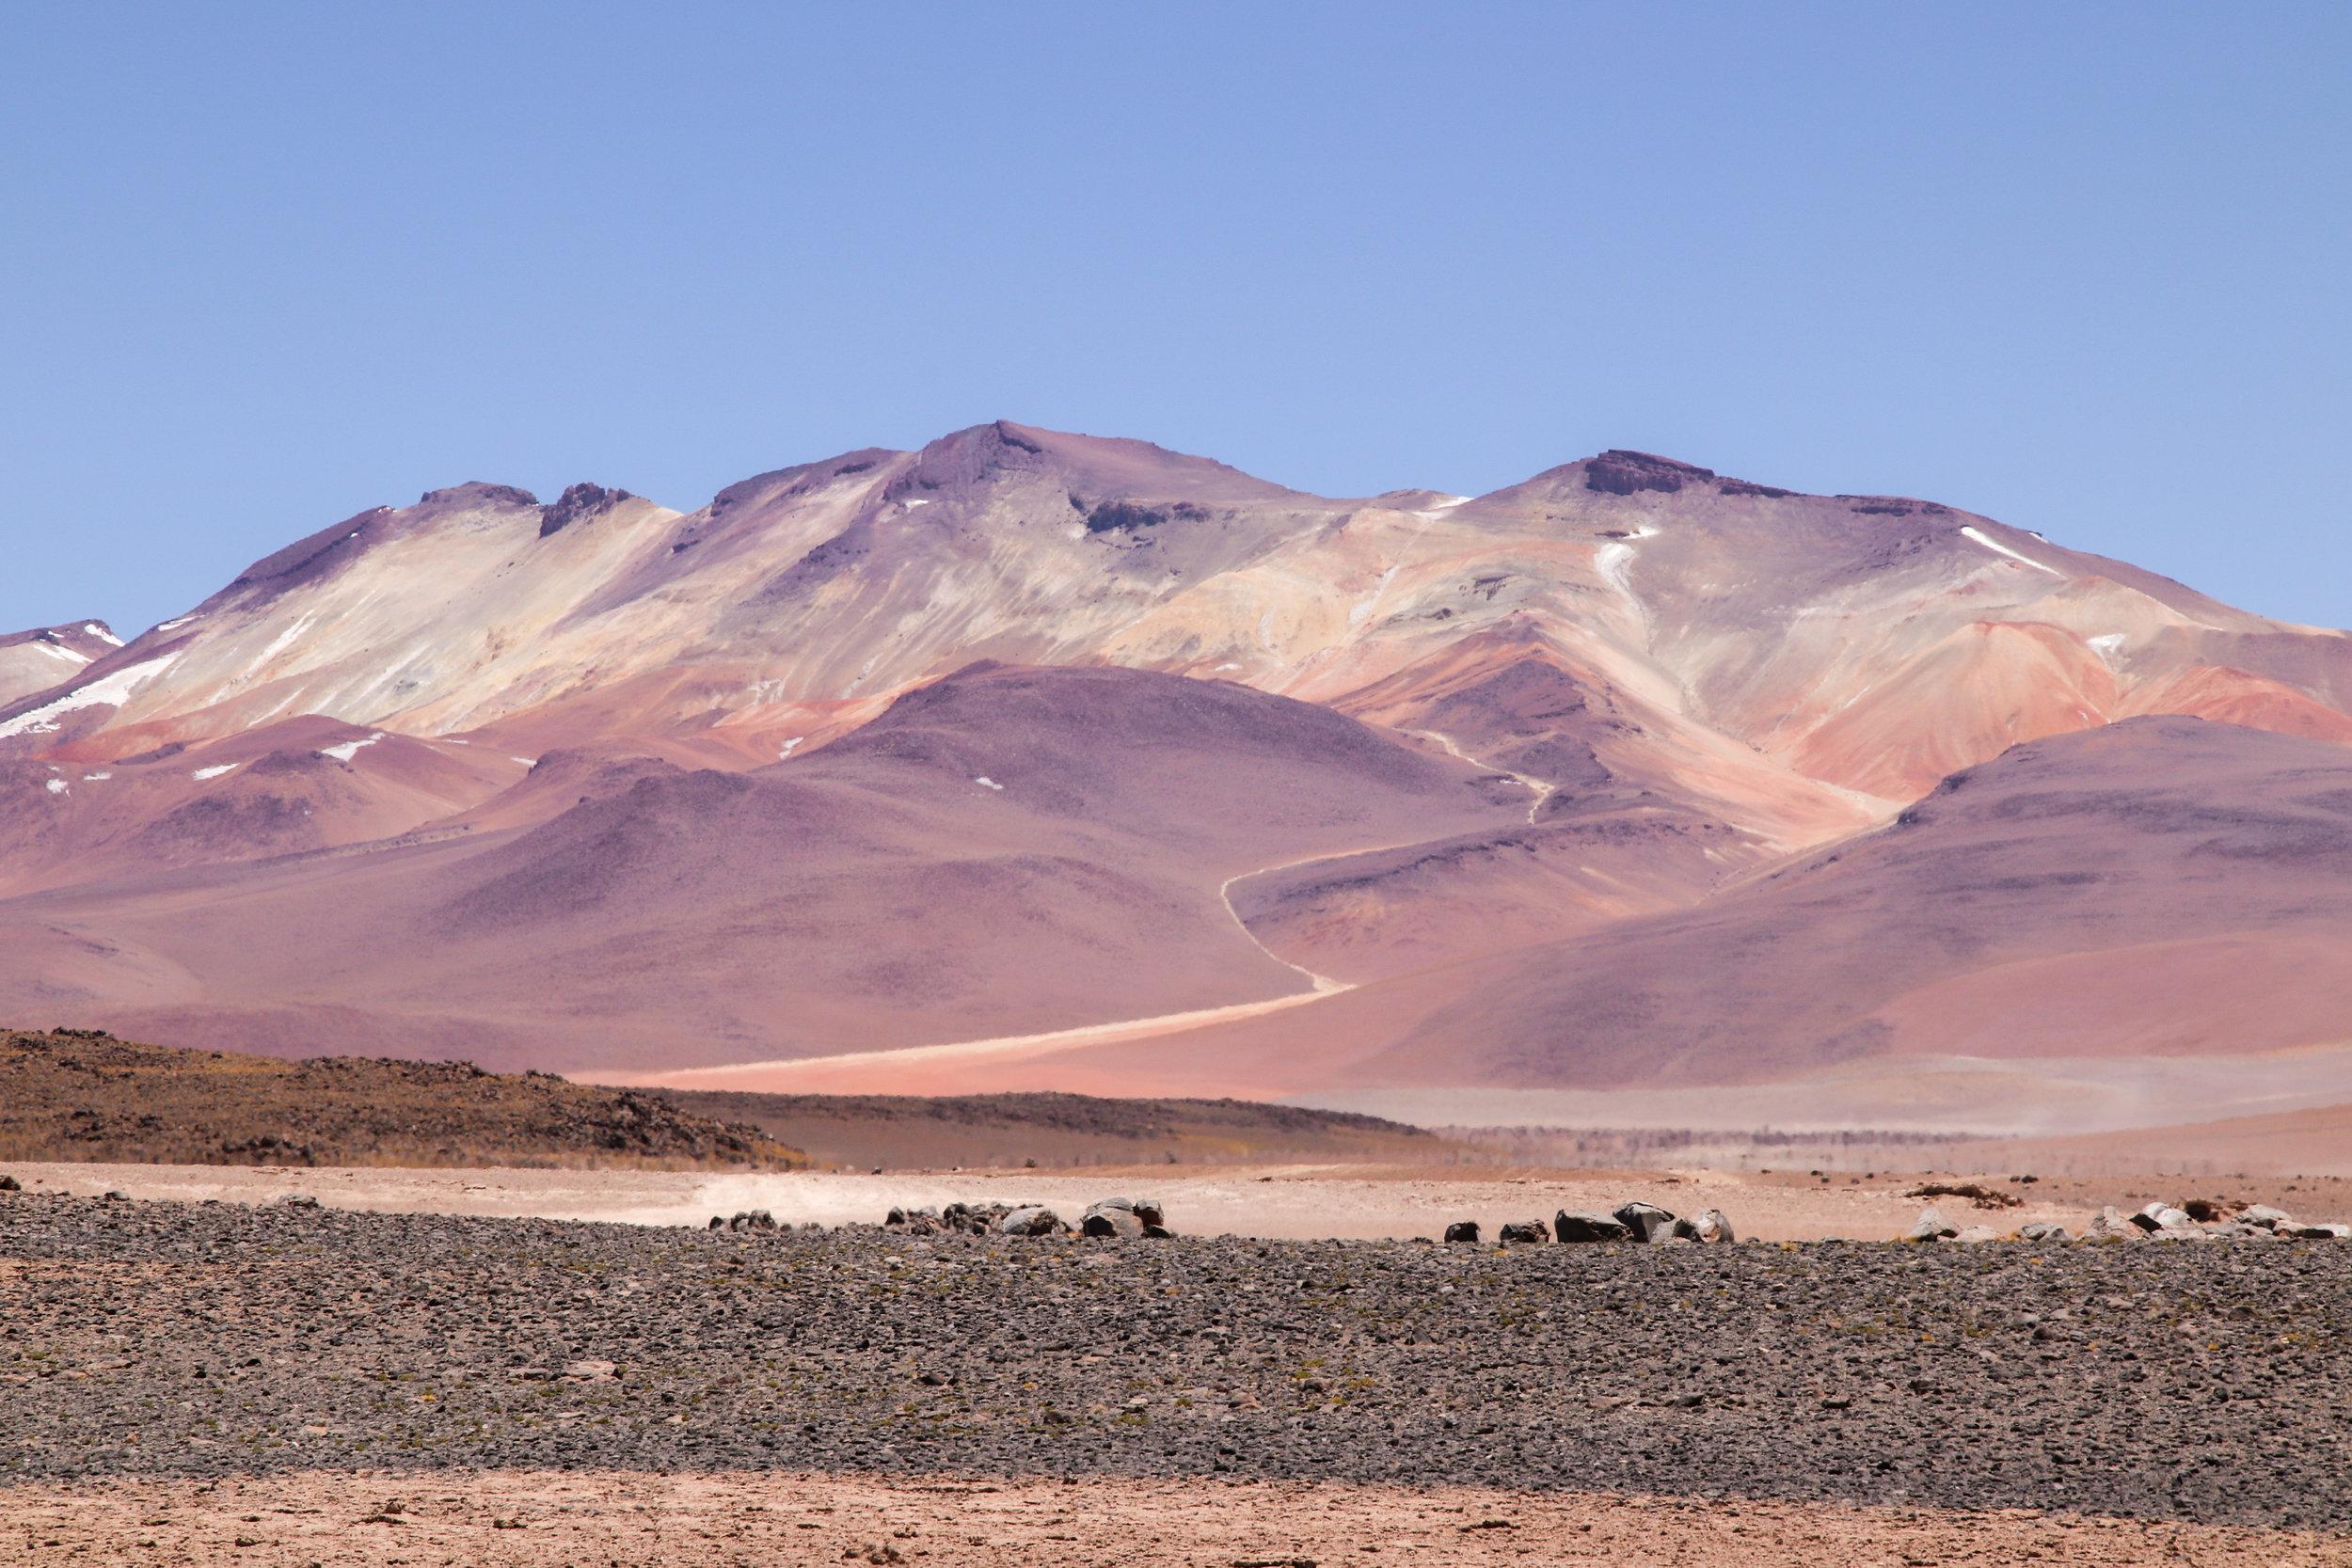 IMG_6345Salt Flat Mountains.jpg